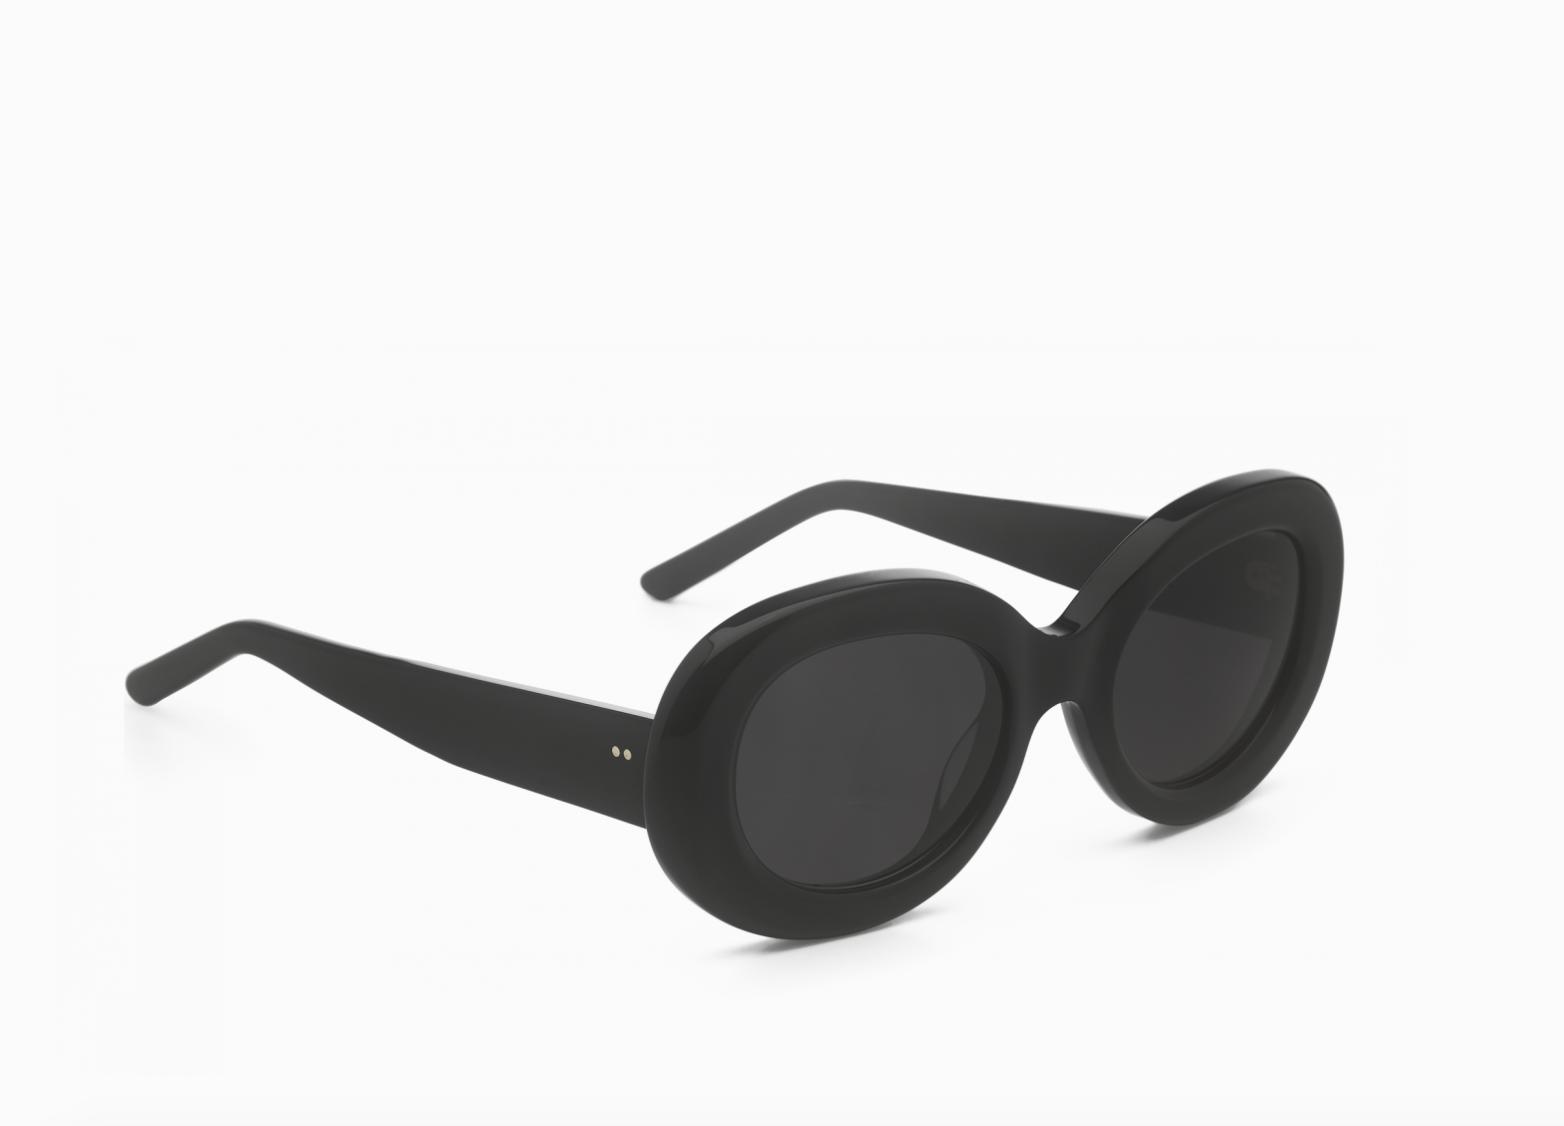 Ace & Tate 90s Sunglasses